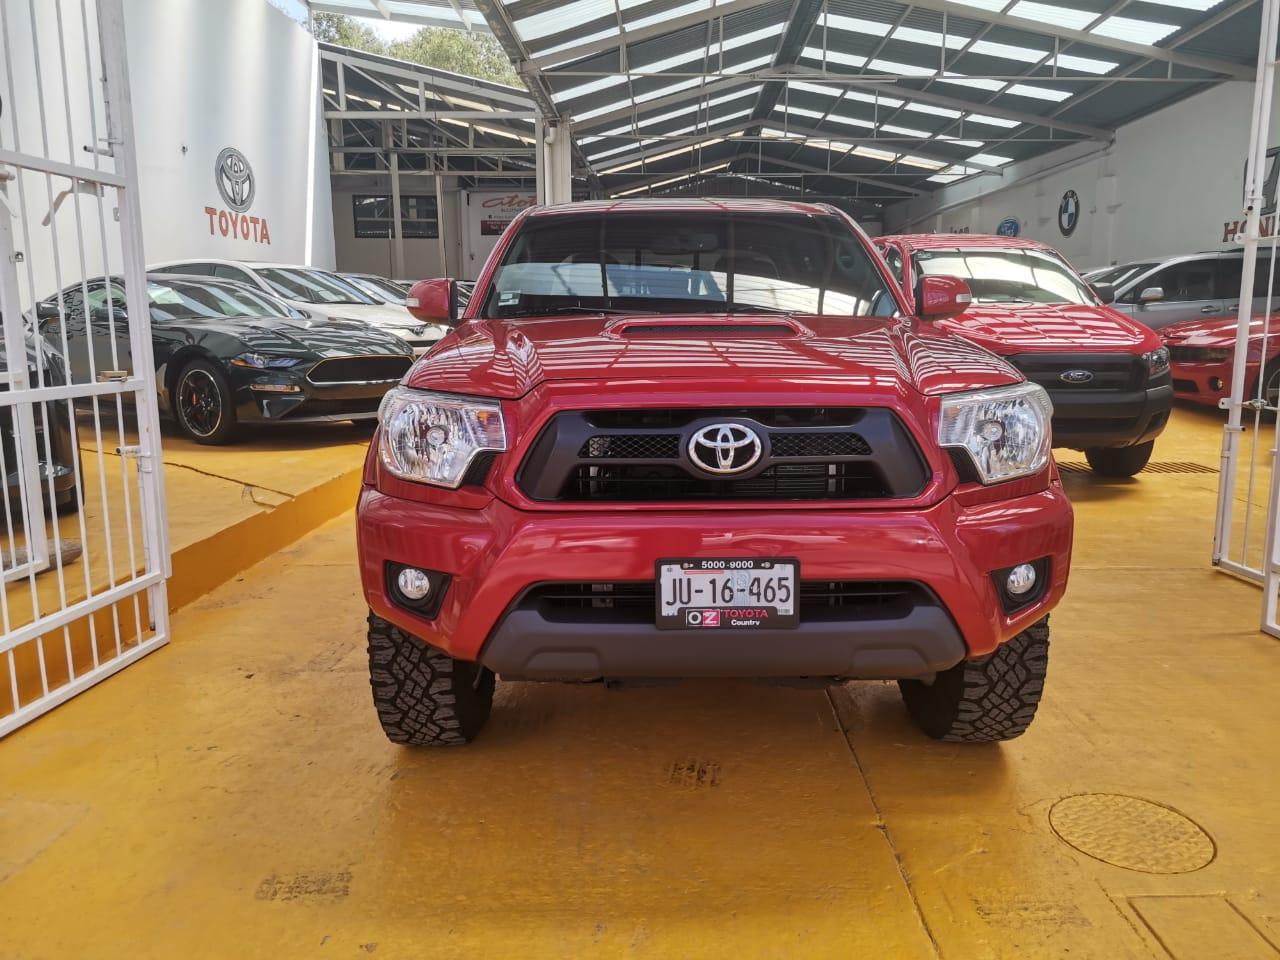 Toyota Tacoma 2014 TRD Sport lleno